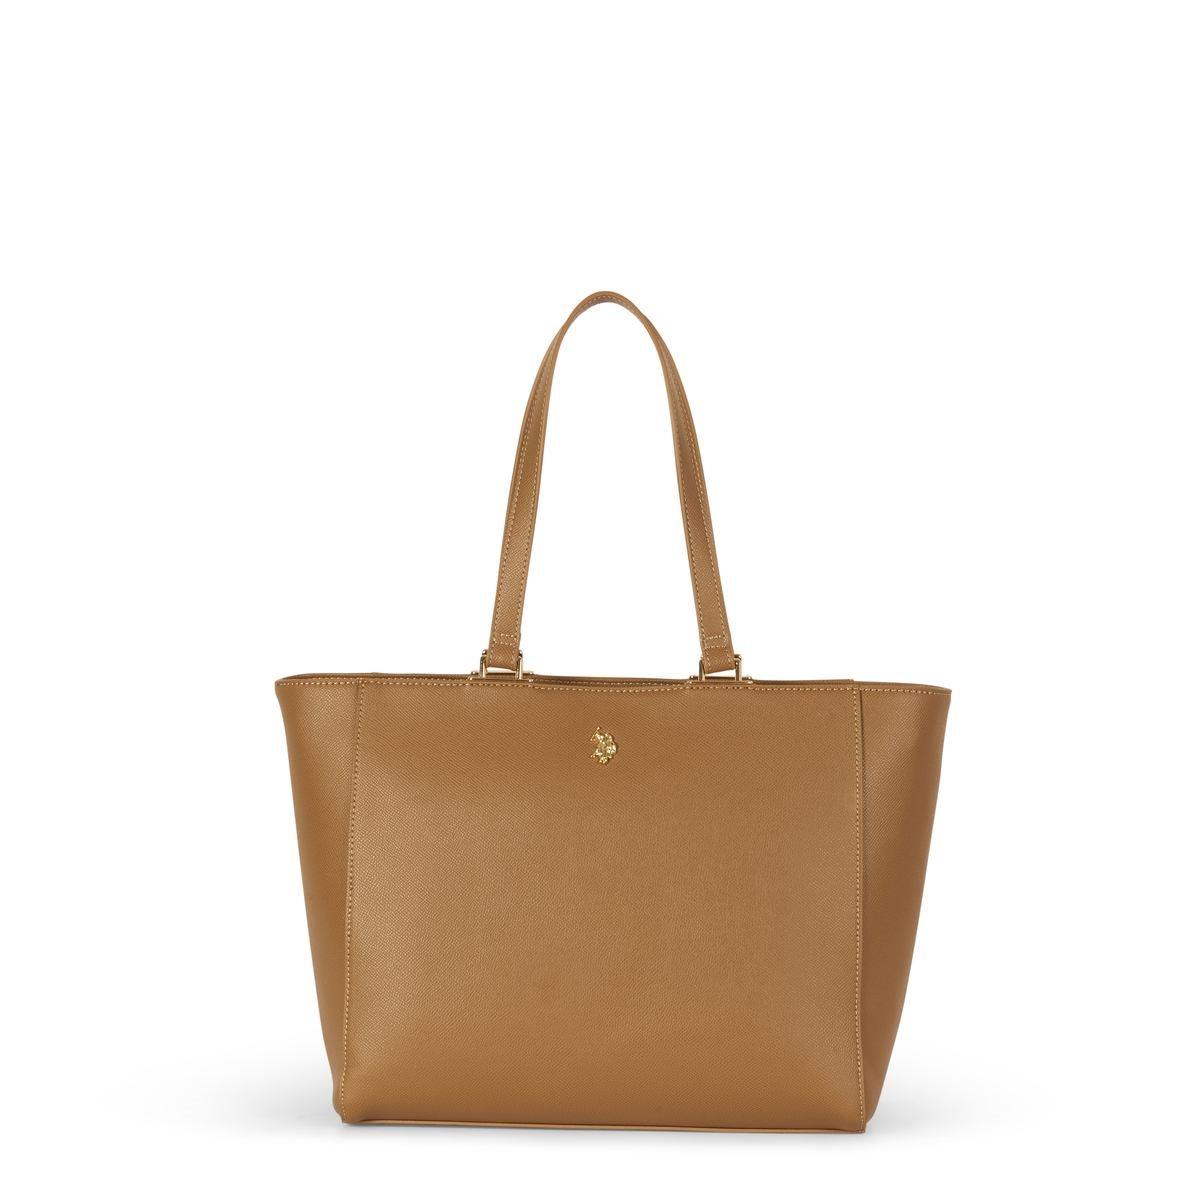 US Polo Assn. Τσάντα χειρός γυναικεία 32x15x27cm Jones Camel